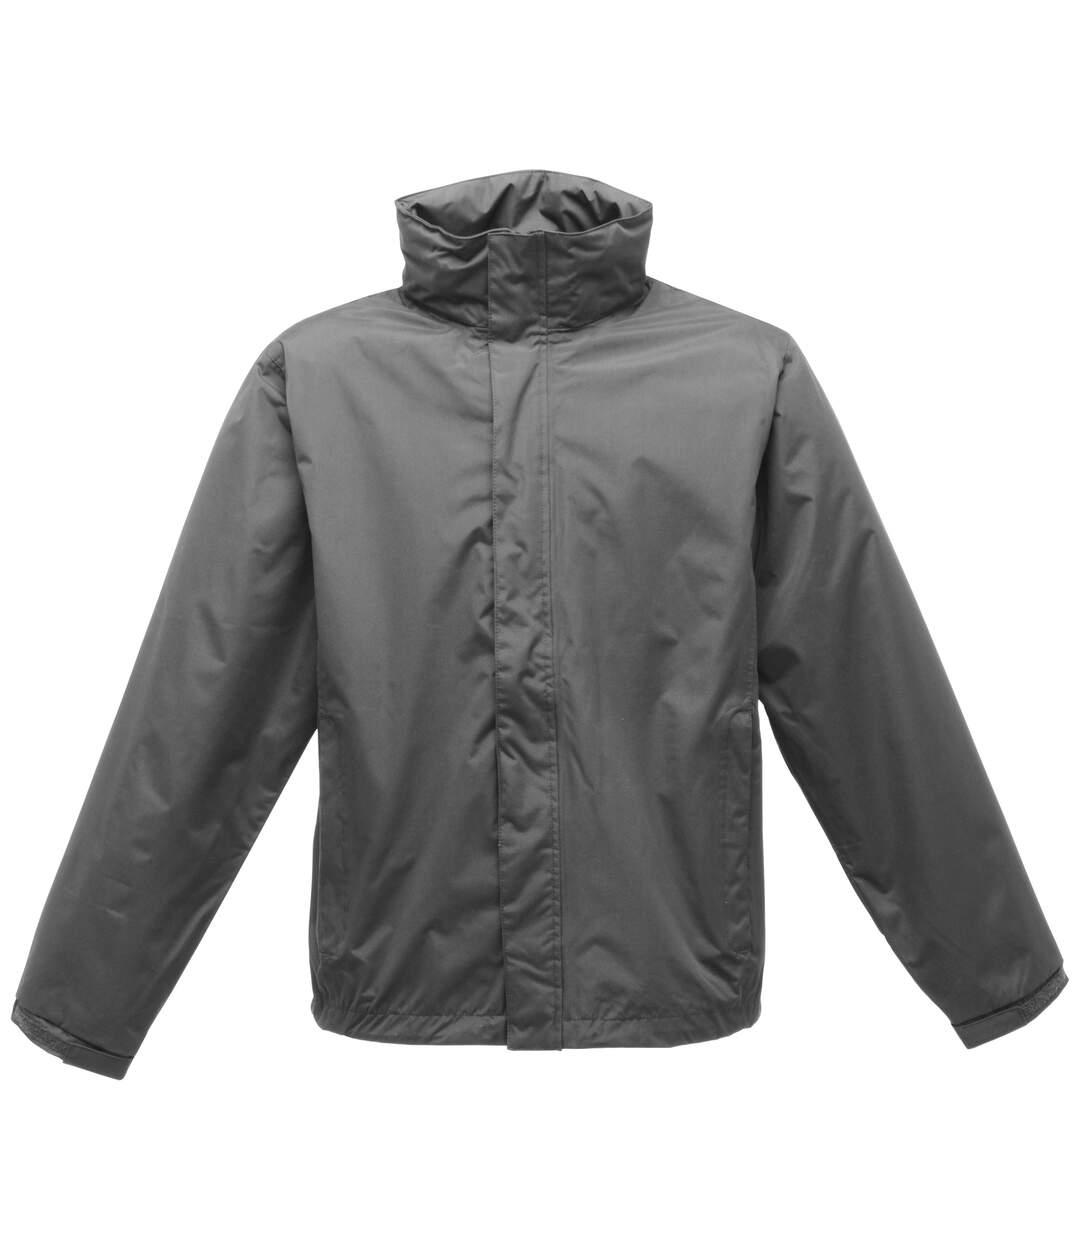 Regatta Mens Pace II Lightweight Waterproof Jacket (Seal Grey) - UTBC1495